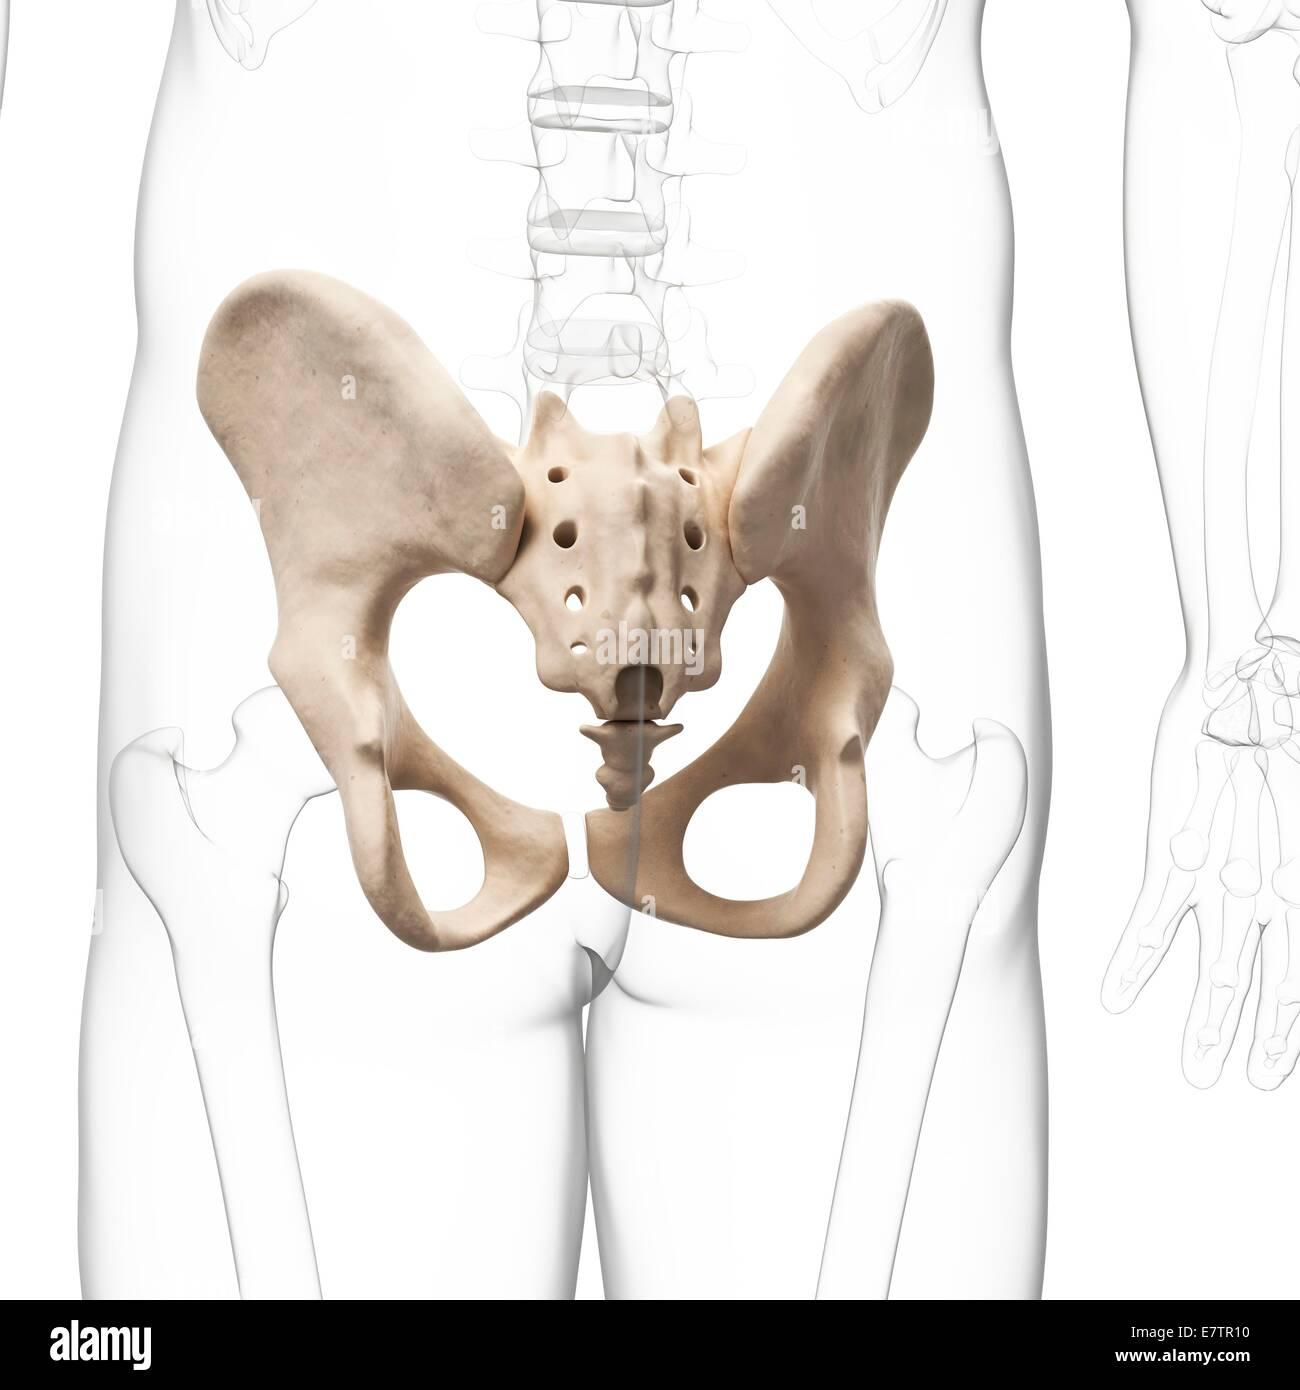 Pelvic Bone 3d Stockfotos & Pelvic Bone 3d Bilder - Alamy